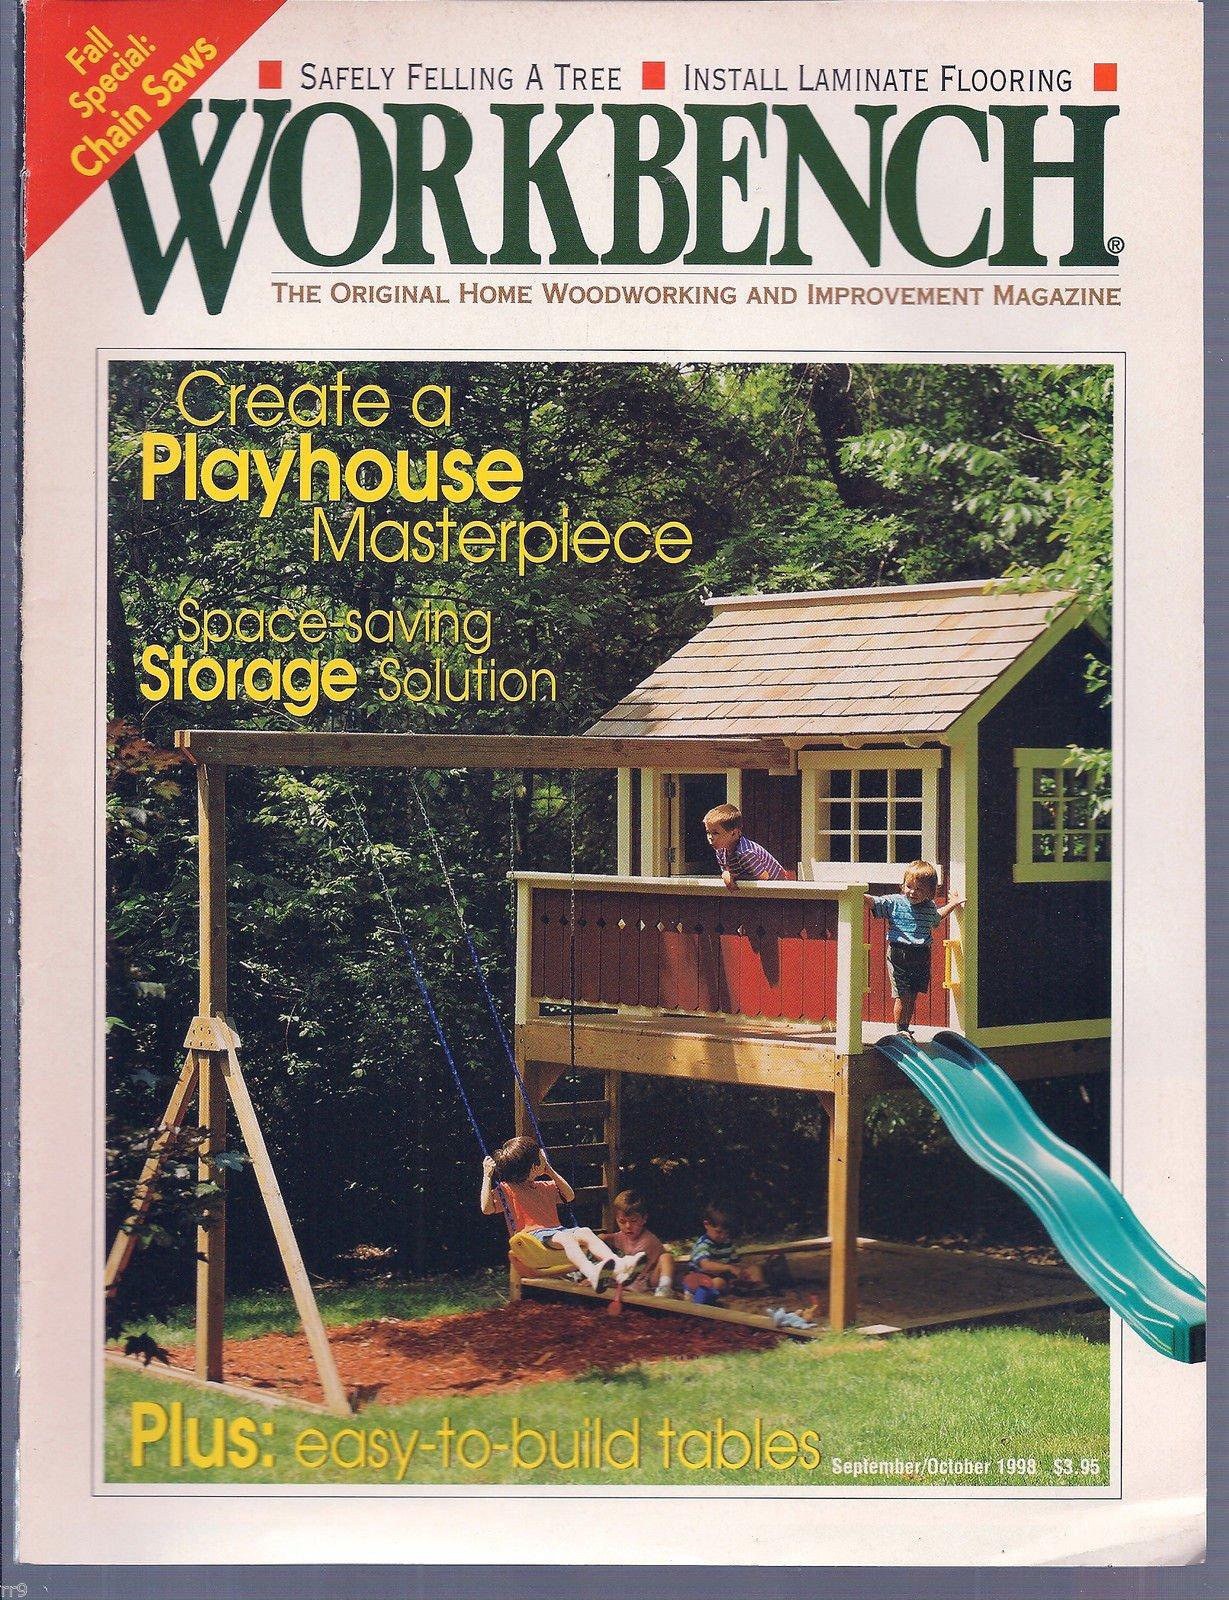 Workbench September October 1998 Home Woodworking